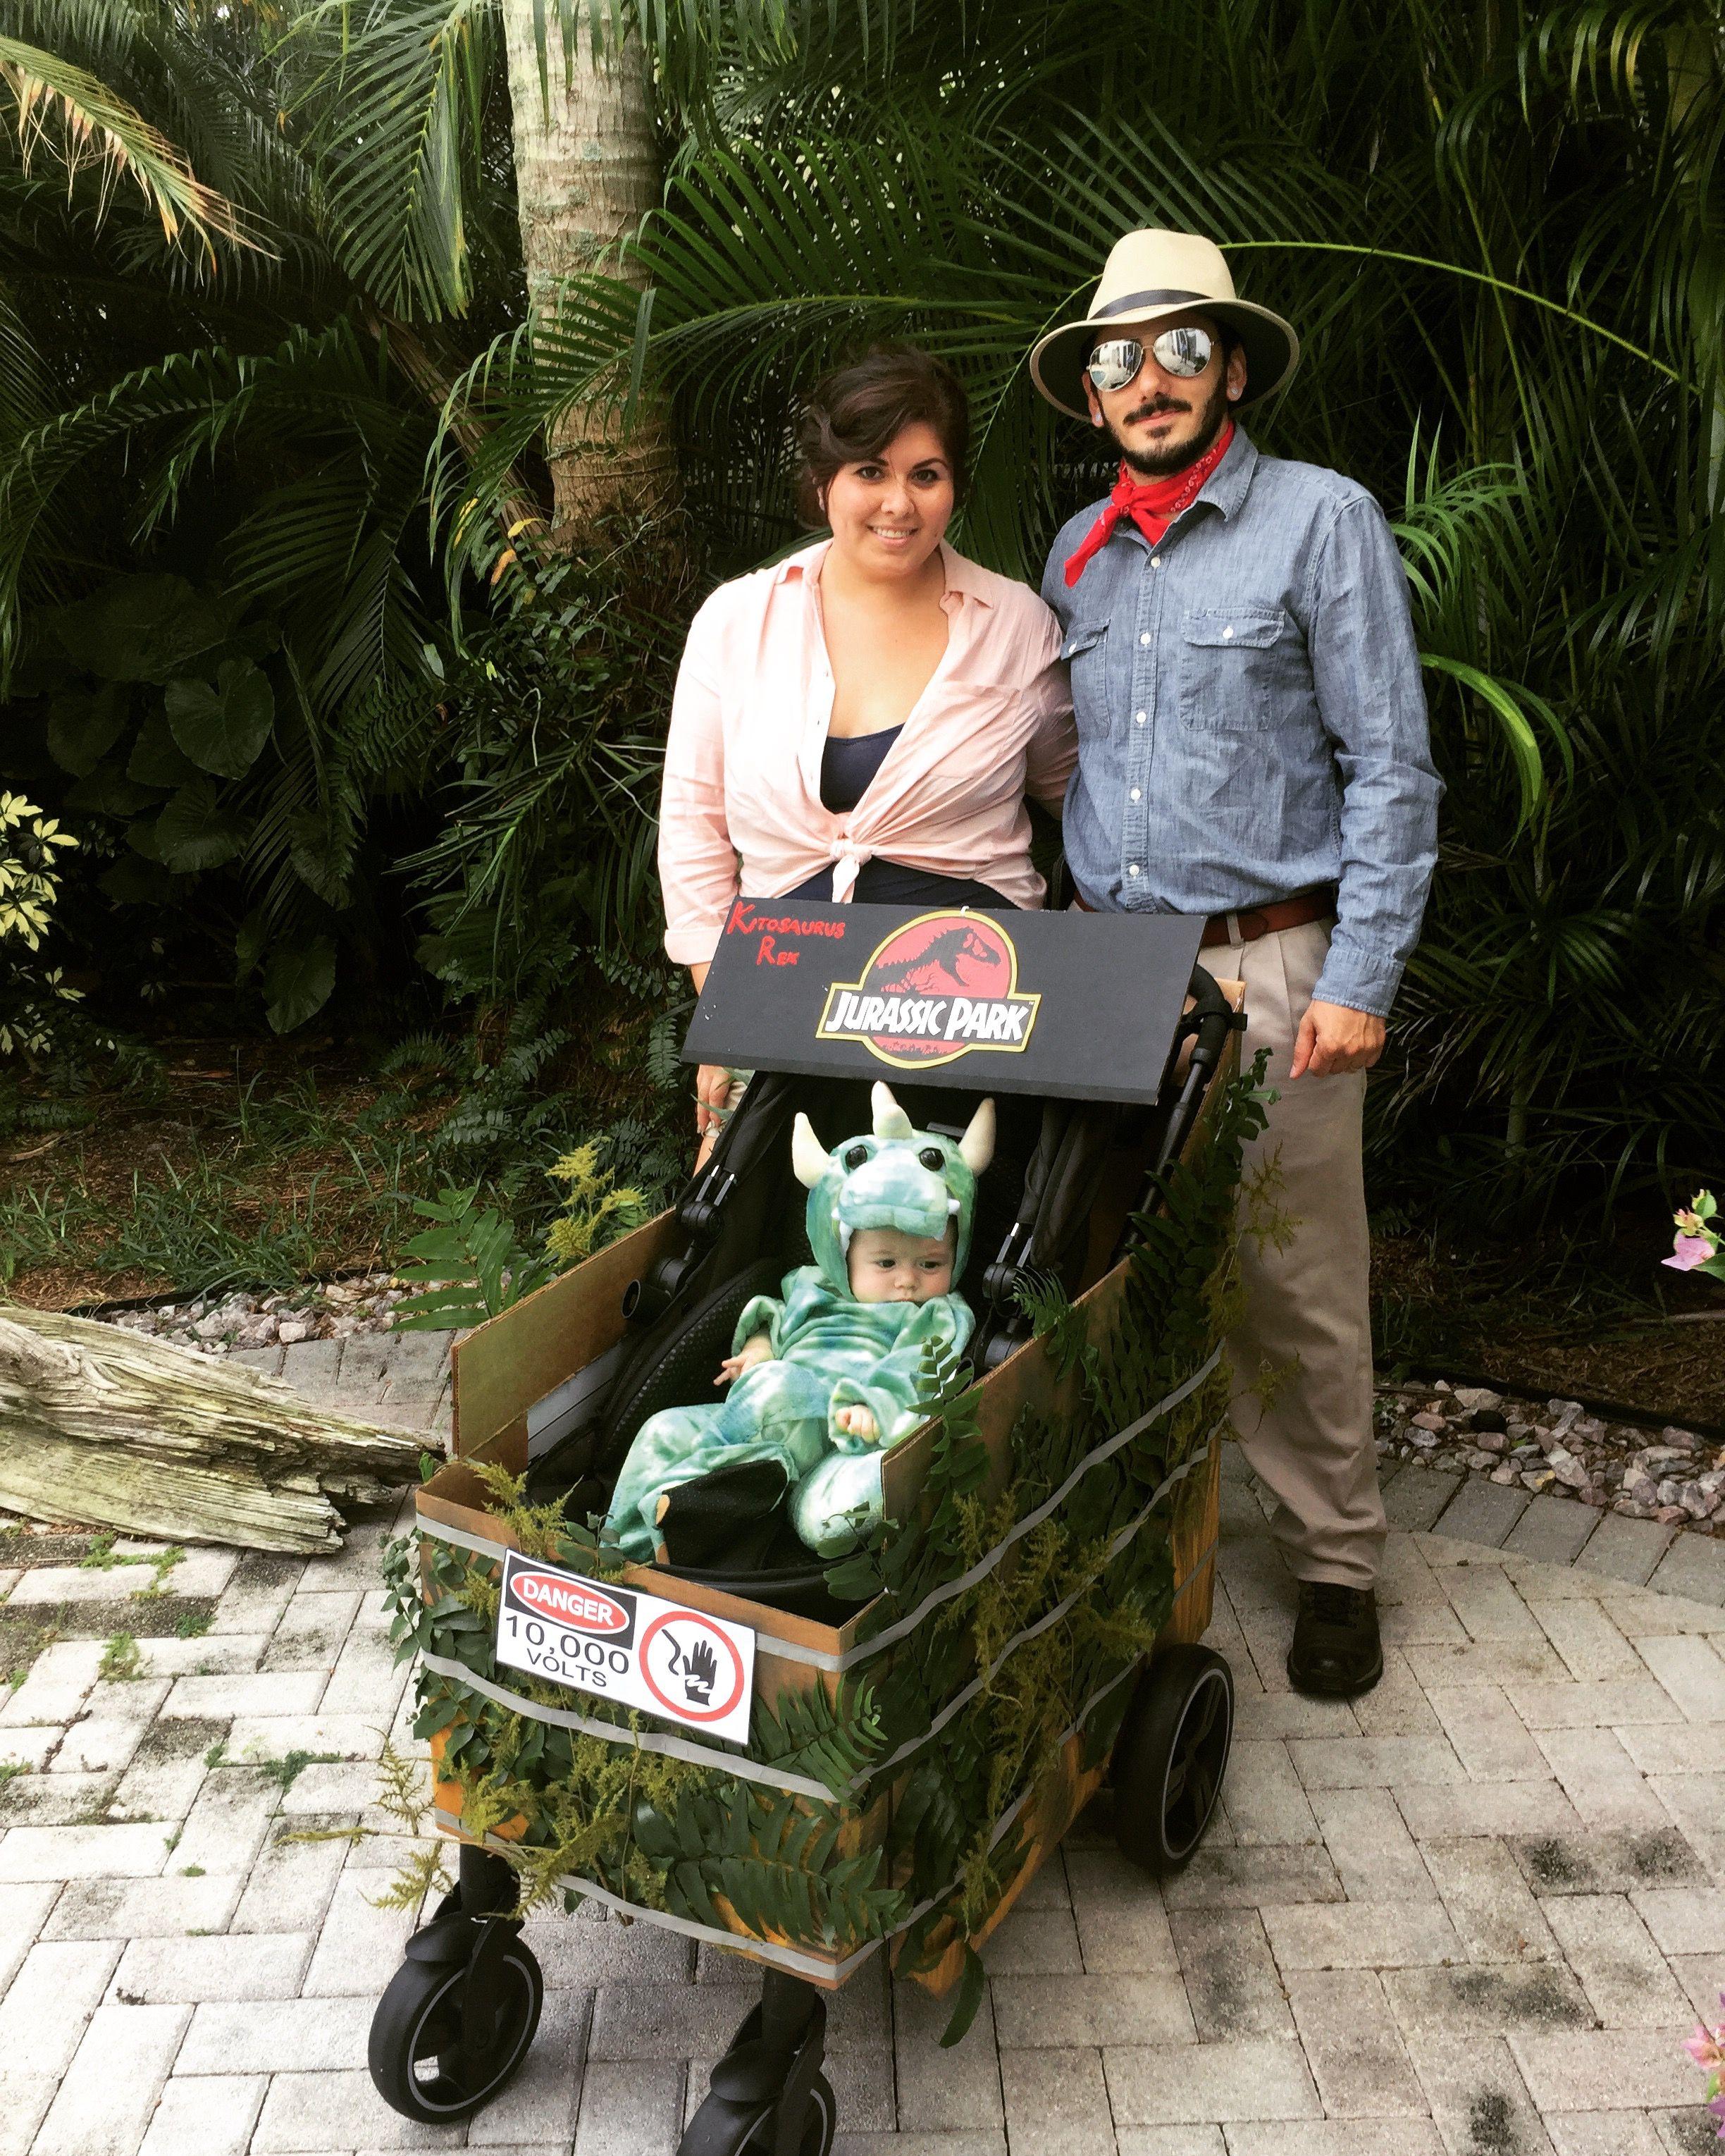 Jurassic park baby and stroller Halloween costume